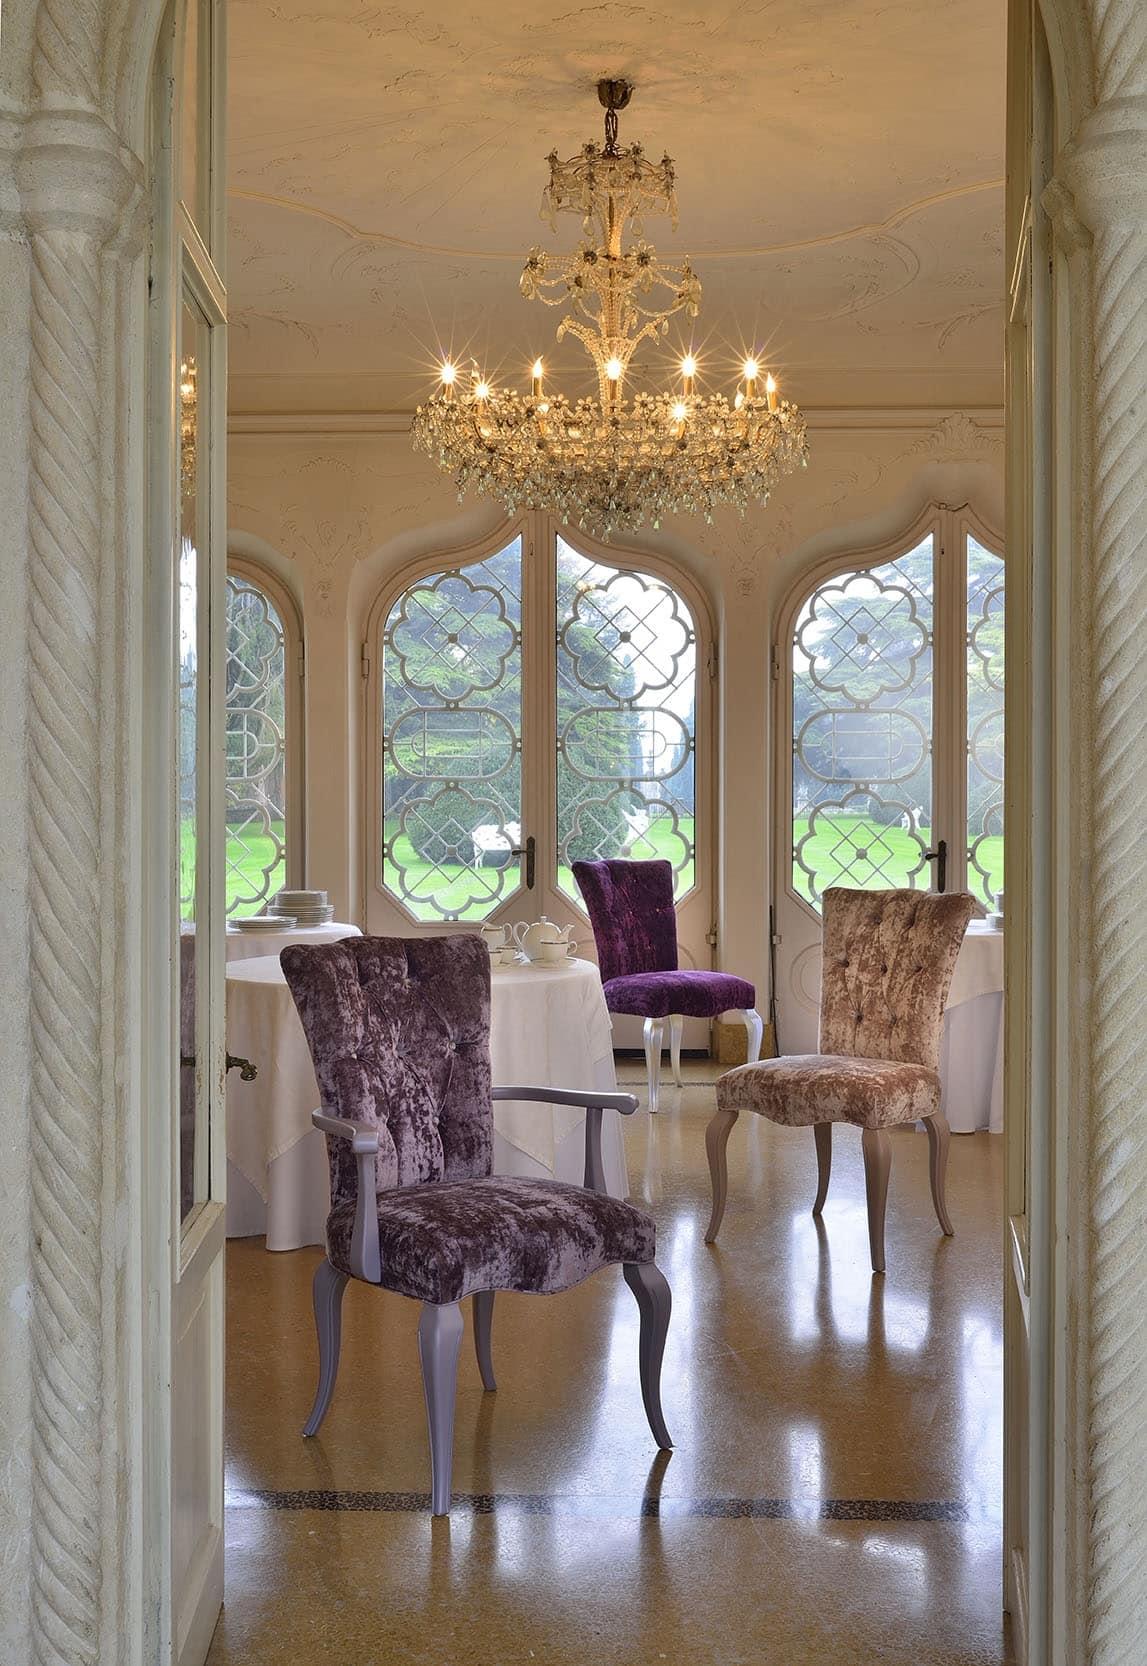 sessel mit gesteppter polsterung luxus im klassischen stil idfdesign. Black Bedroom Furniture Sets. Home Design Ideas